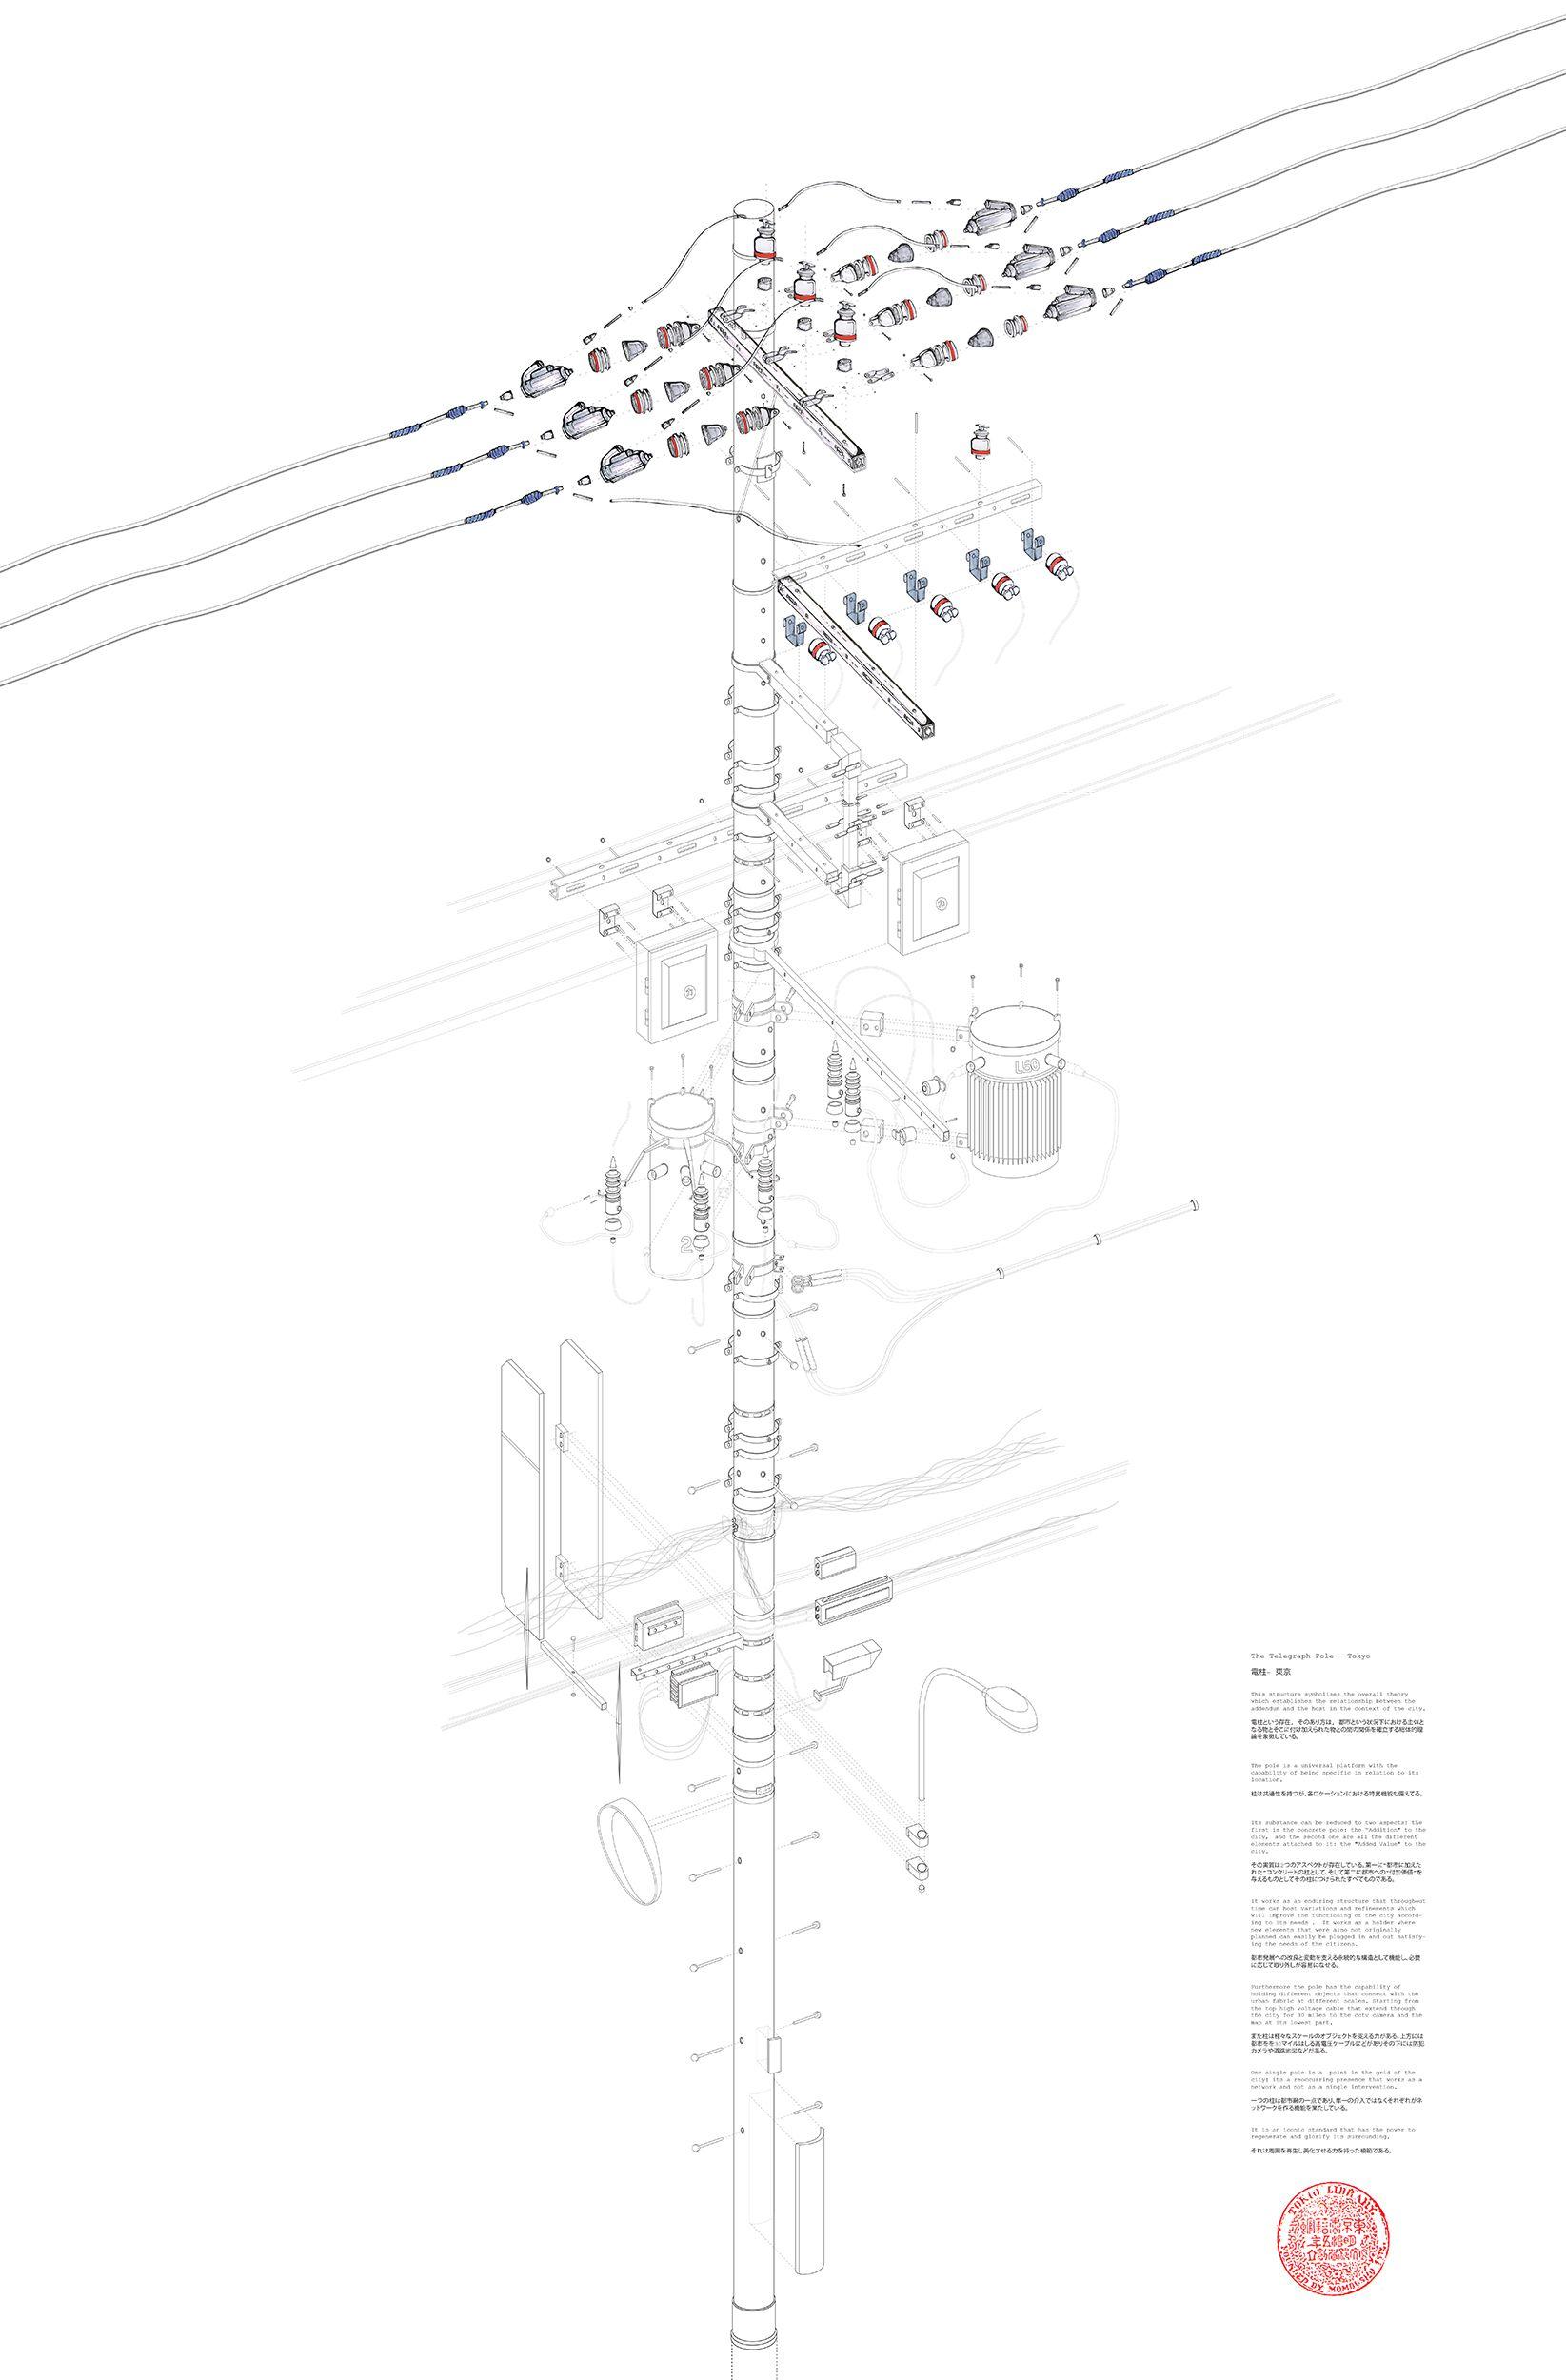 Pin by Huai Kuan Chung on Diagram | Building plan drawing